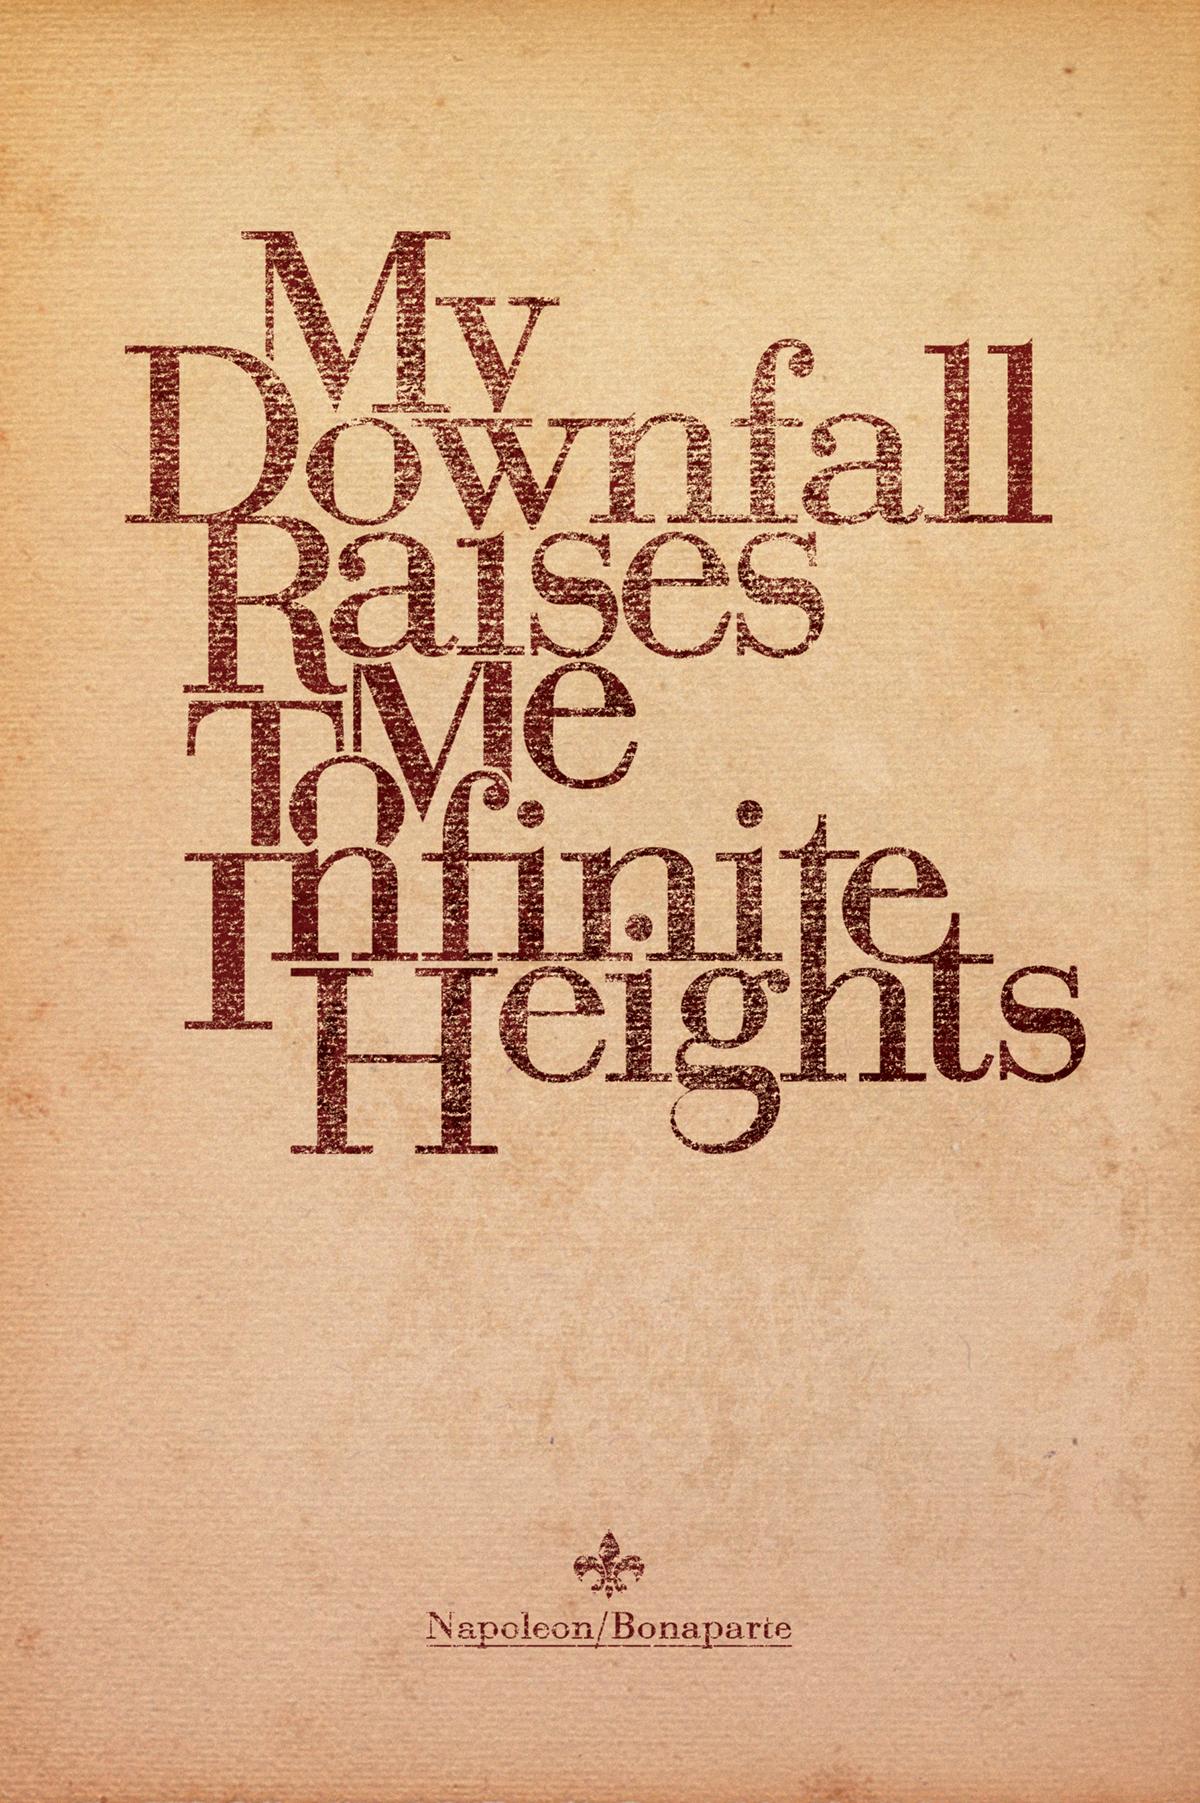 bodoni typographic poster serif inspirational